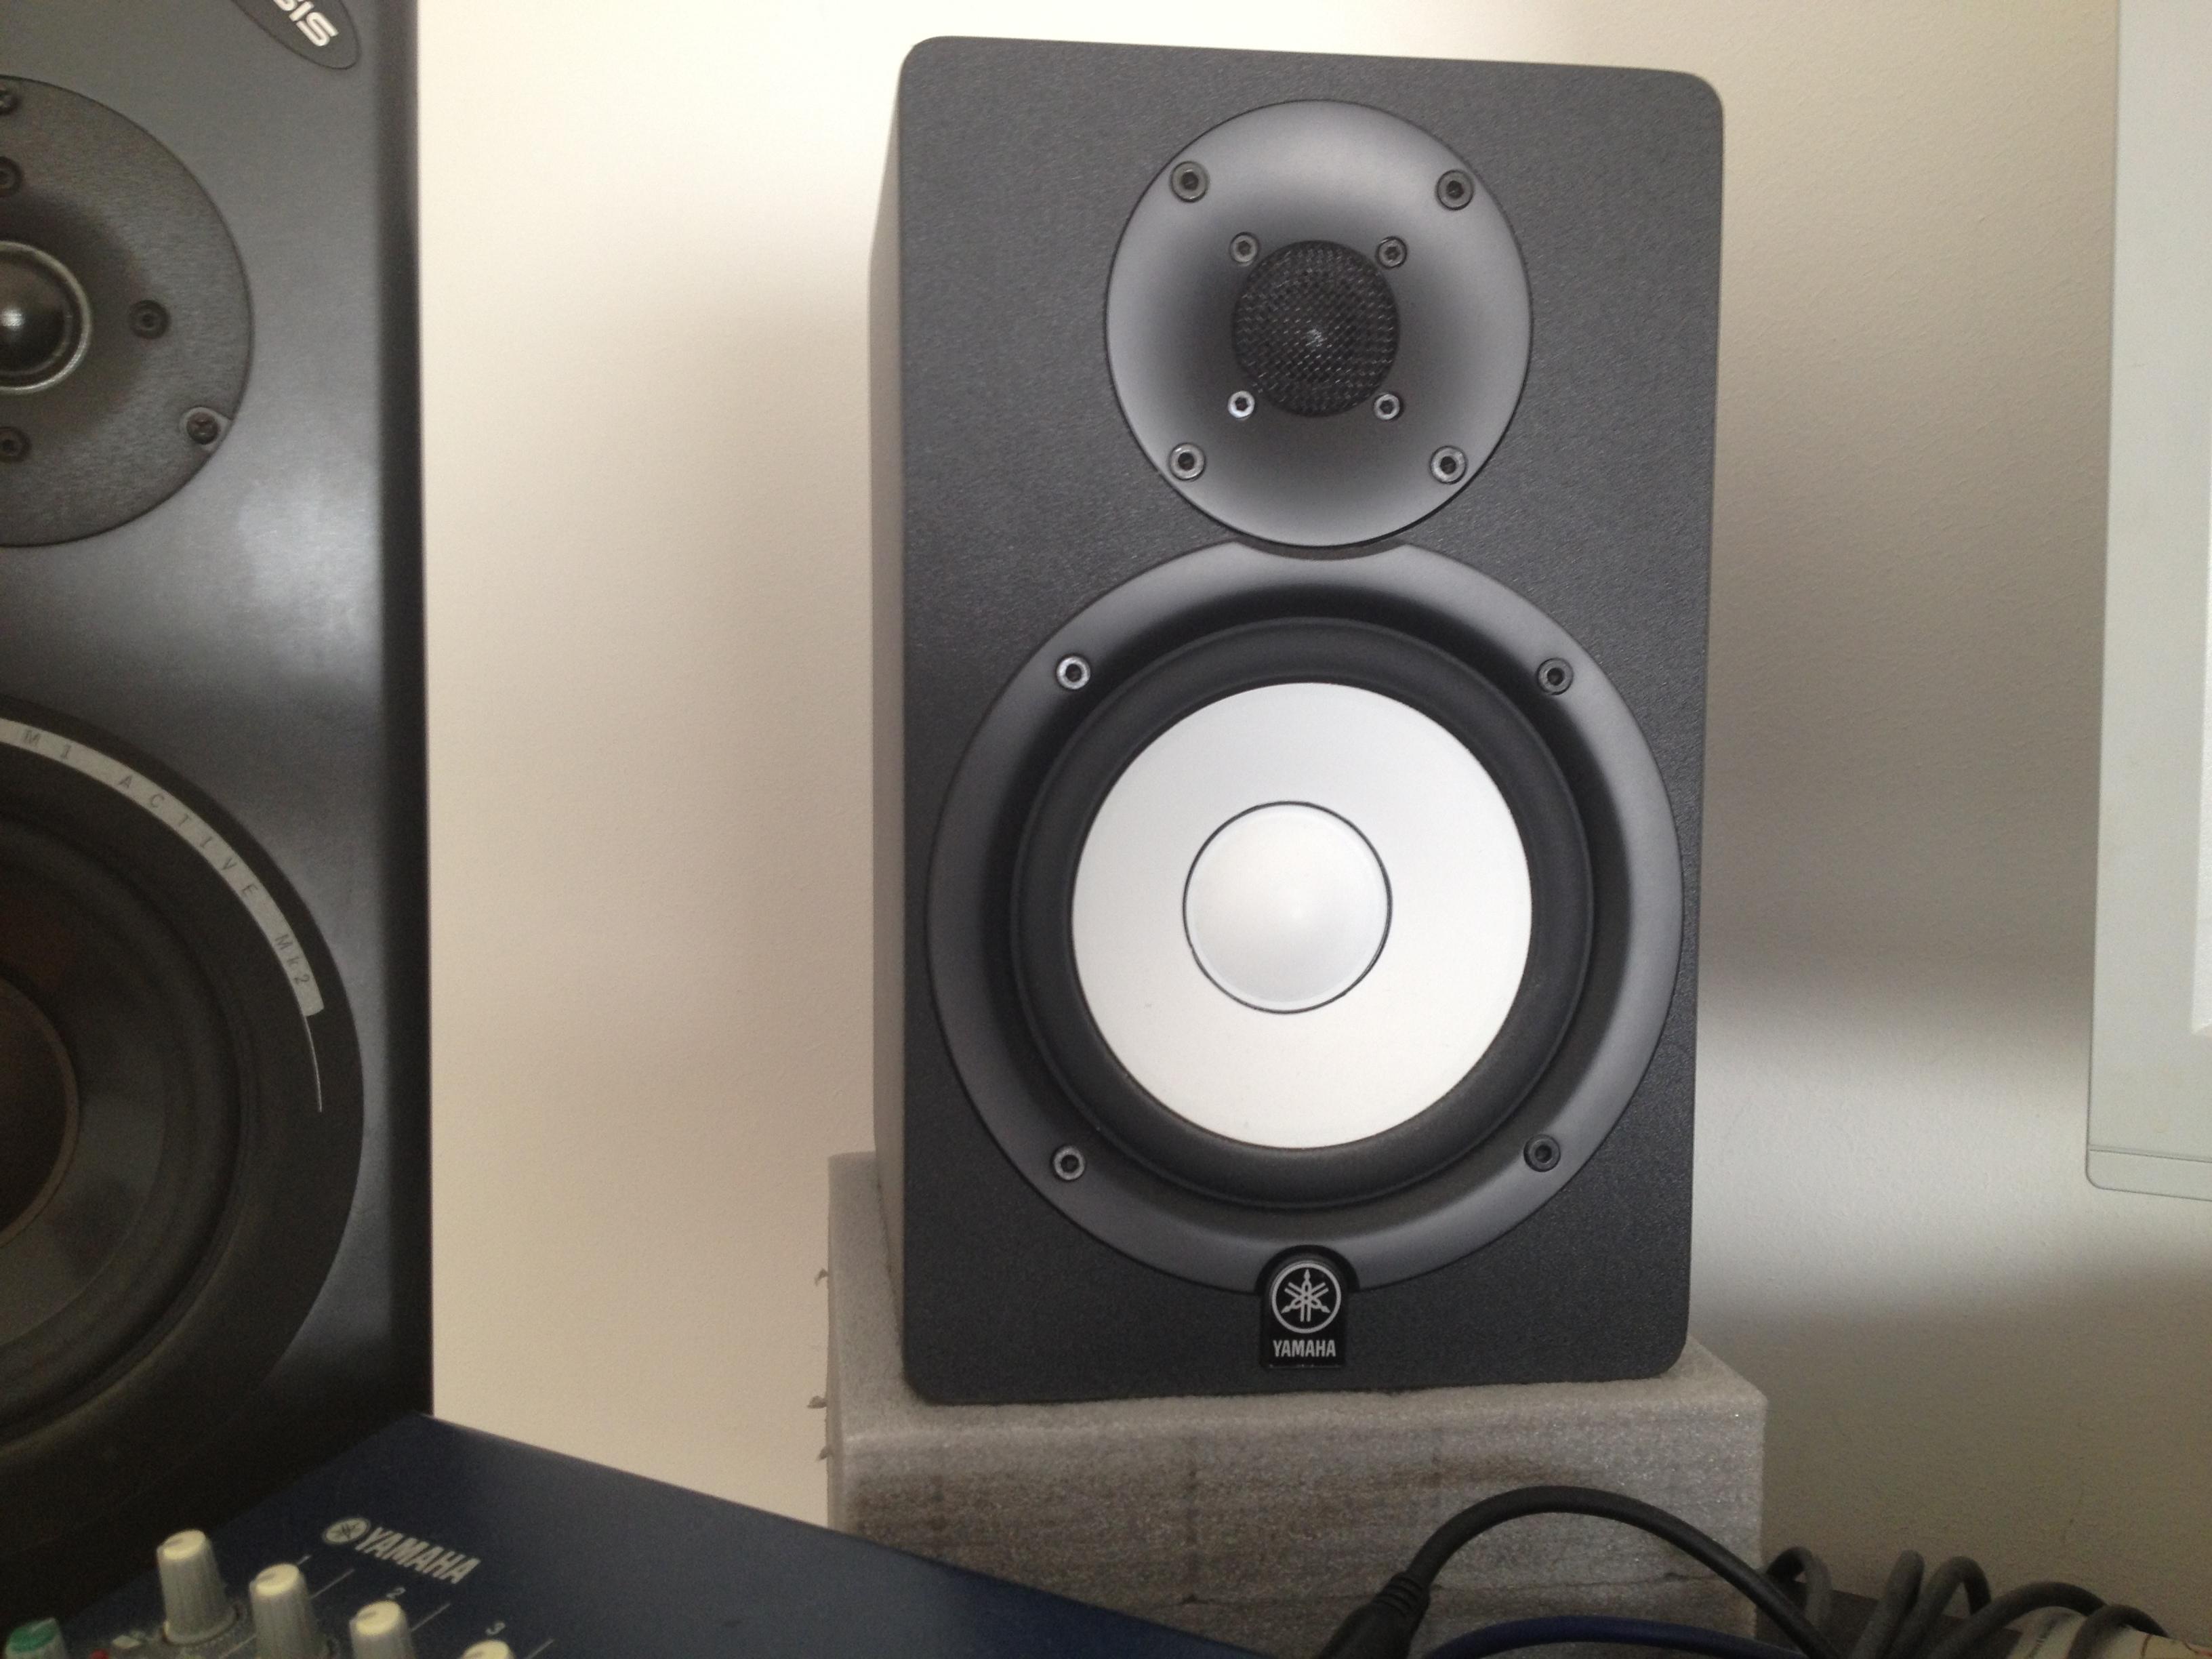 Yamaha hs50m image 665988 audiofanzine for Yamaha hs50m review